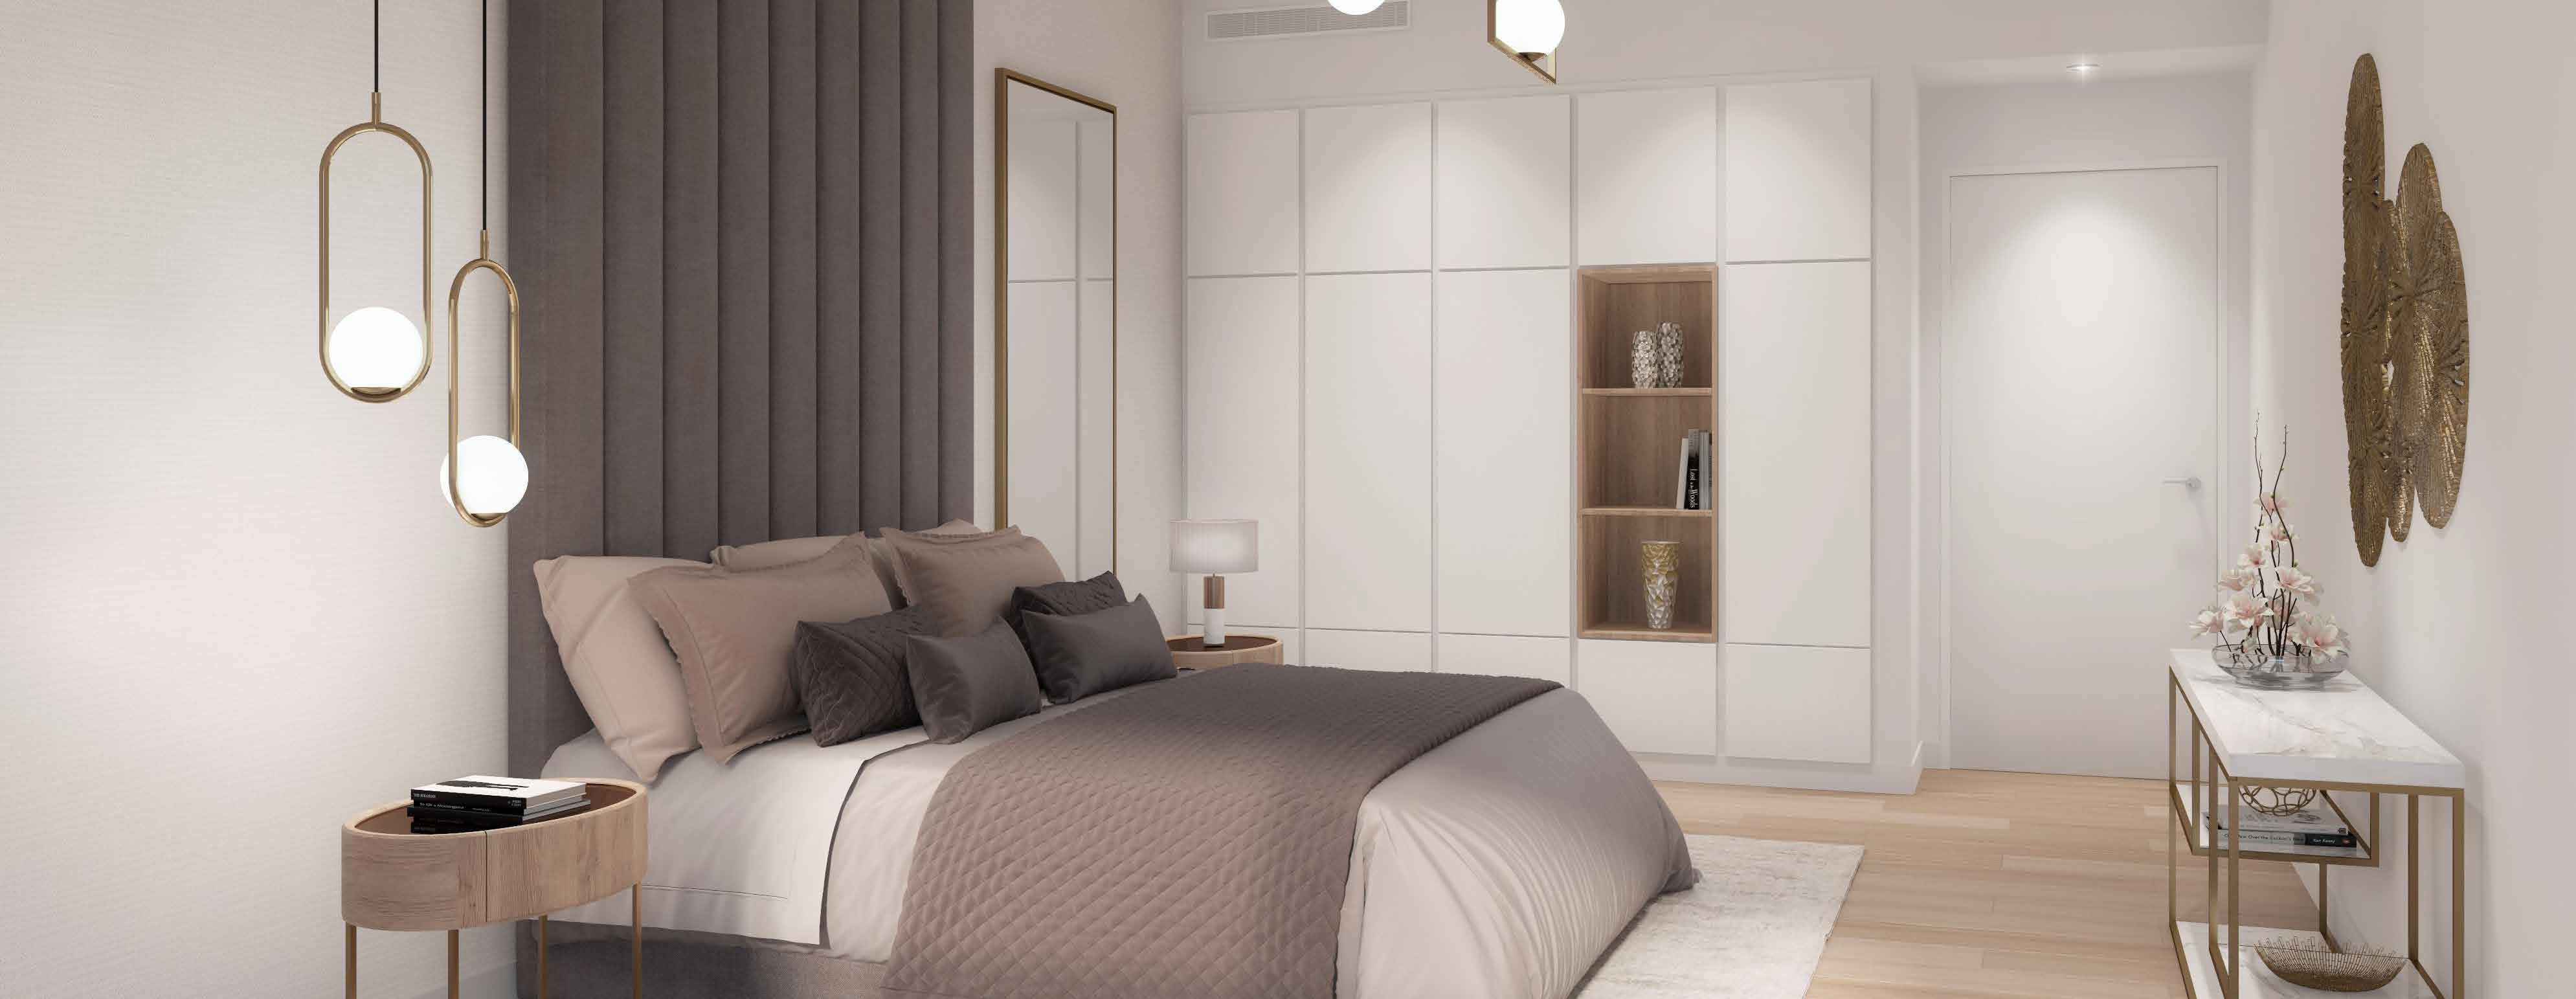 La-Sirene-by-MERAAS-at-Port-De-La-Mer.-Apartments-for-Sale-in-Dubai--31